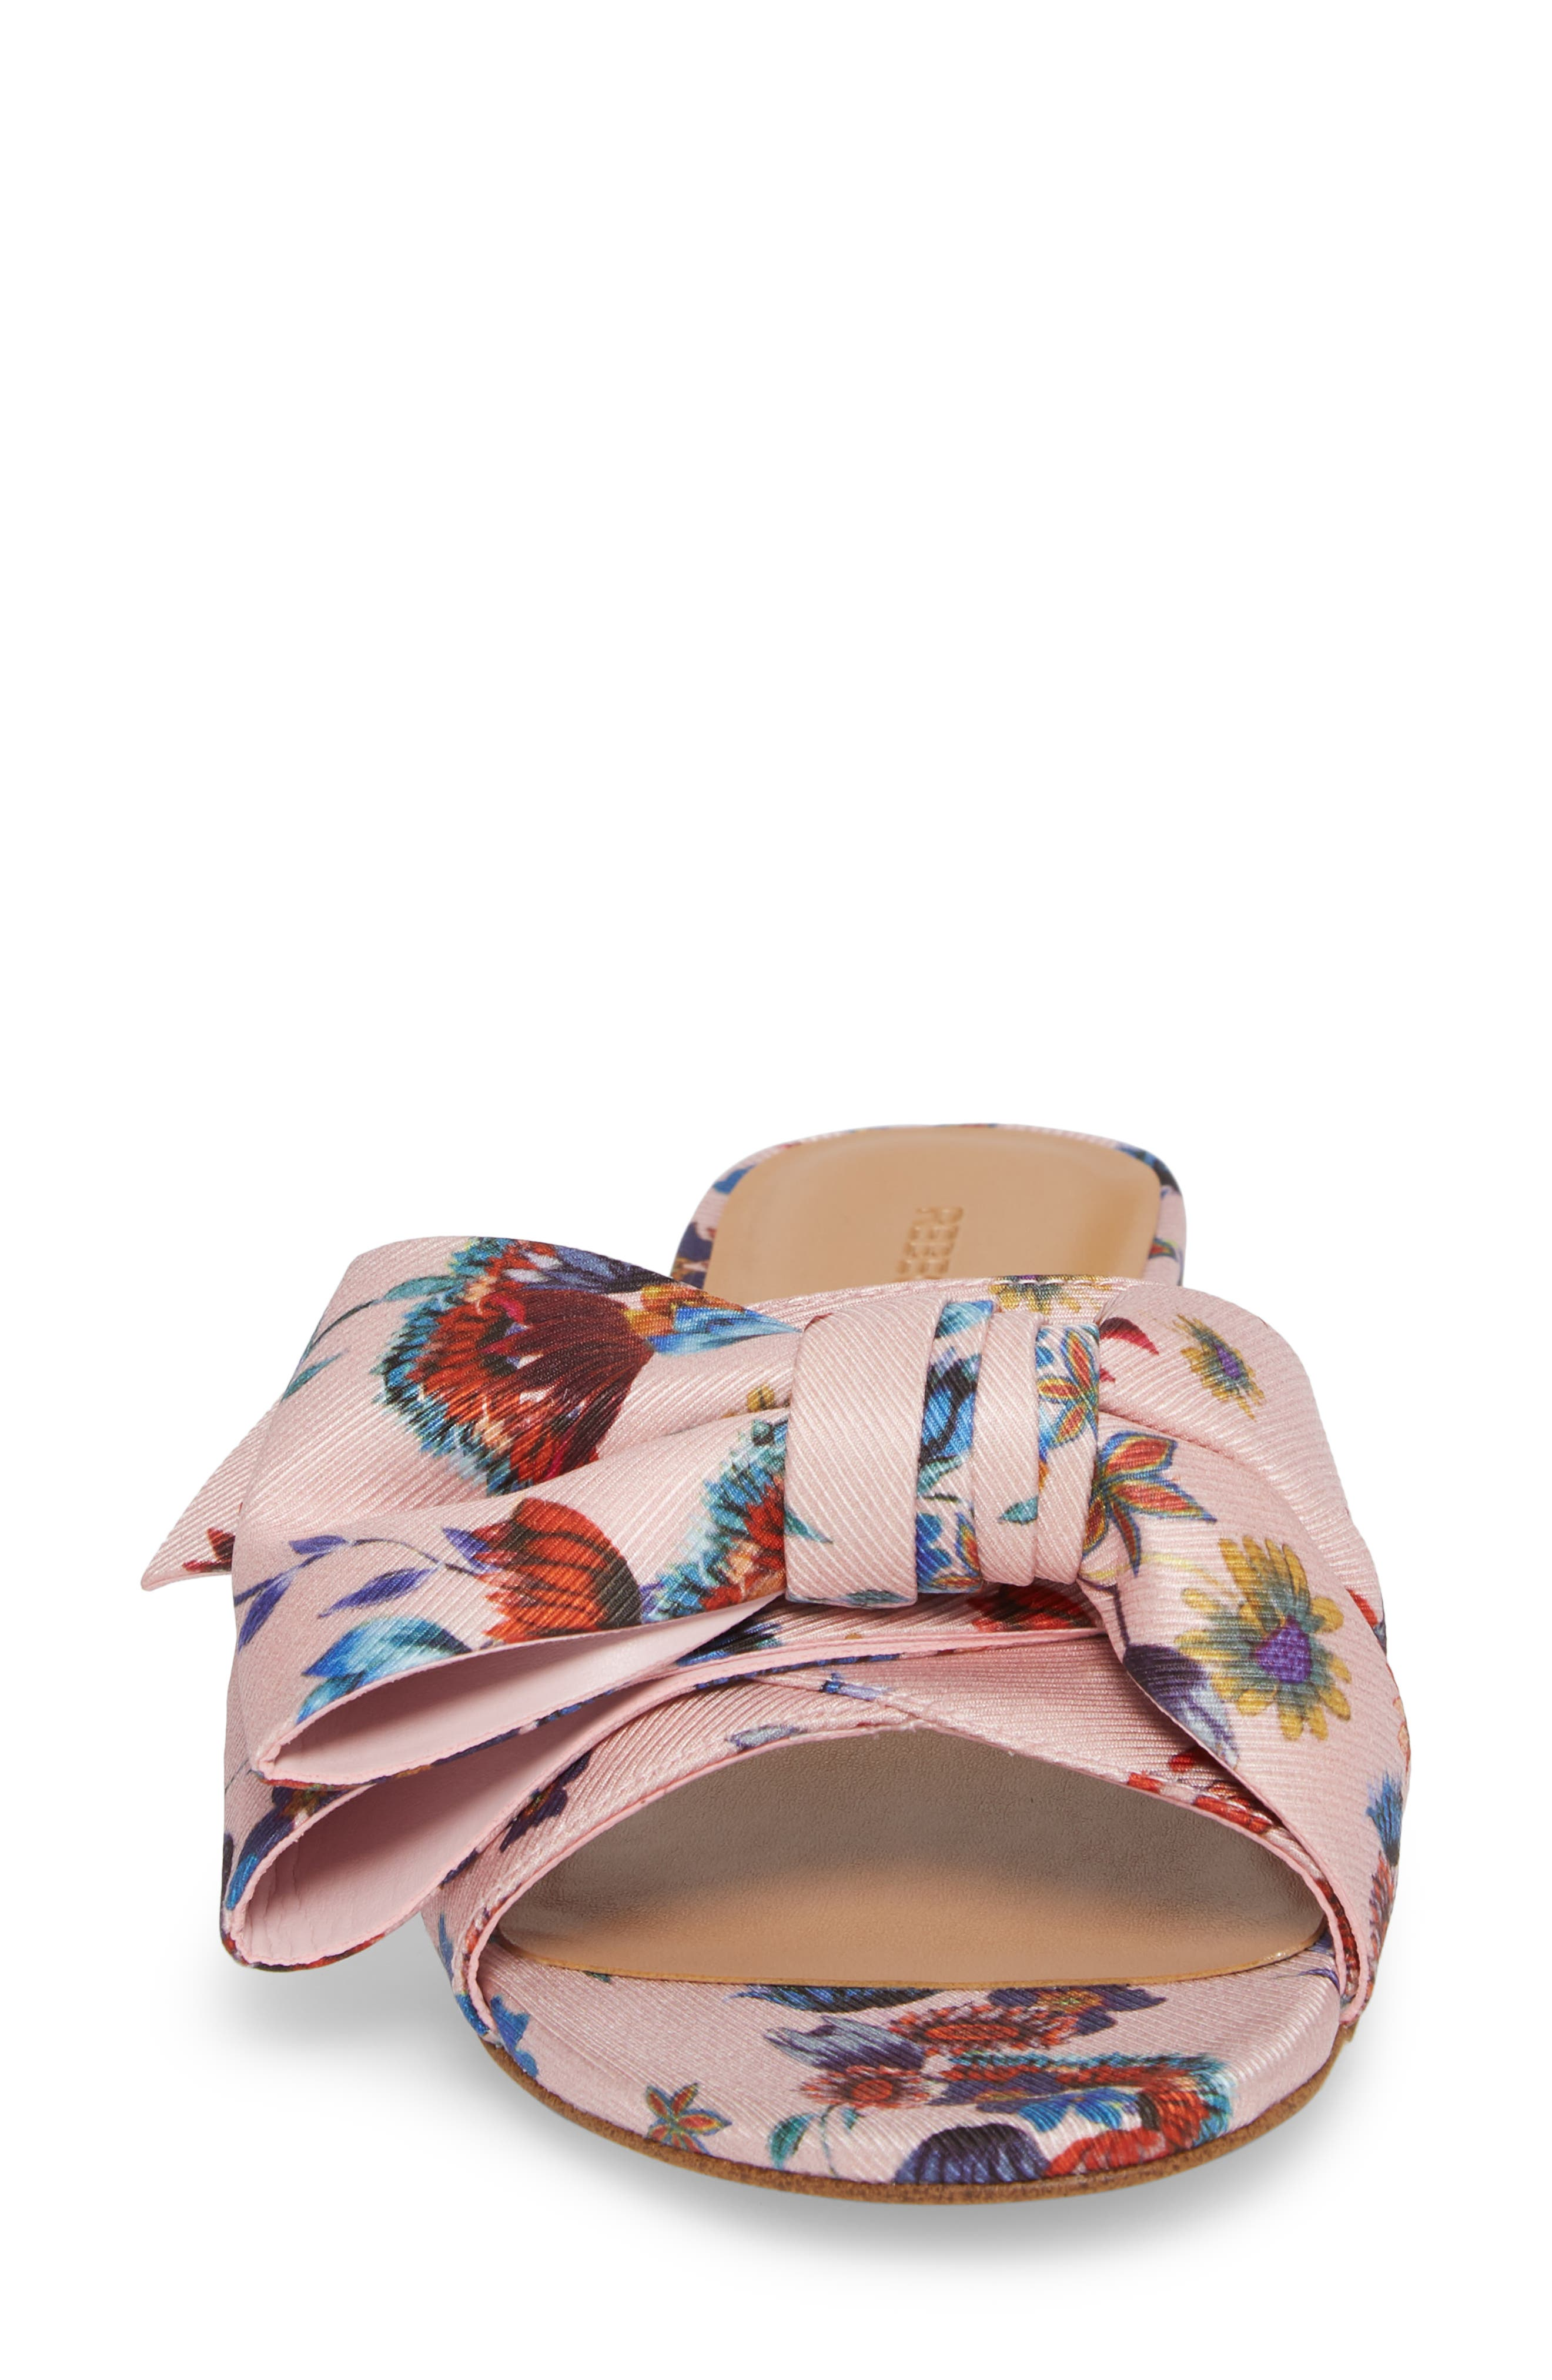 Calista Slide Sandal,                             Alternate thumbnail 4, color,                             Millennial Pink Multi Fabric